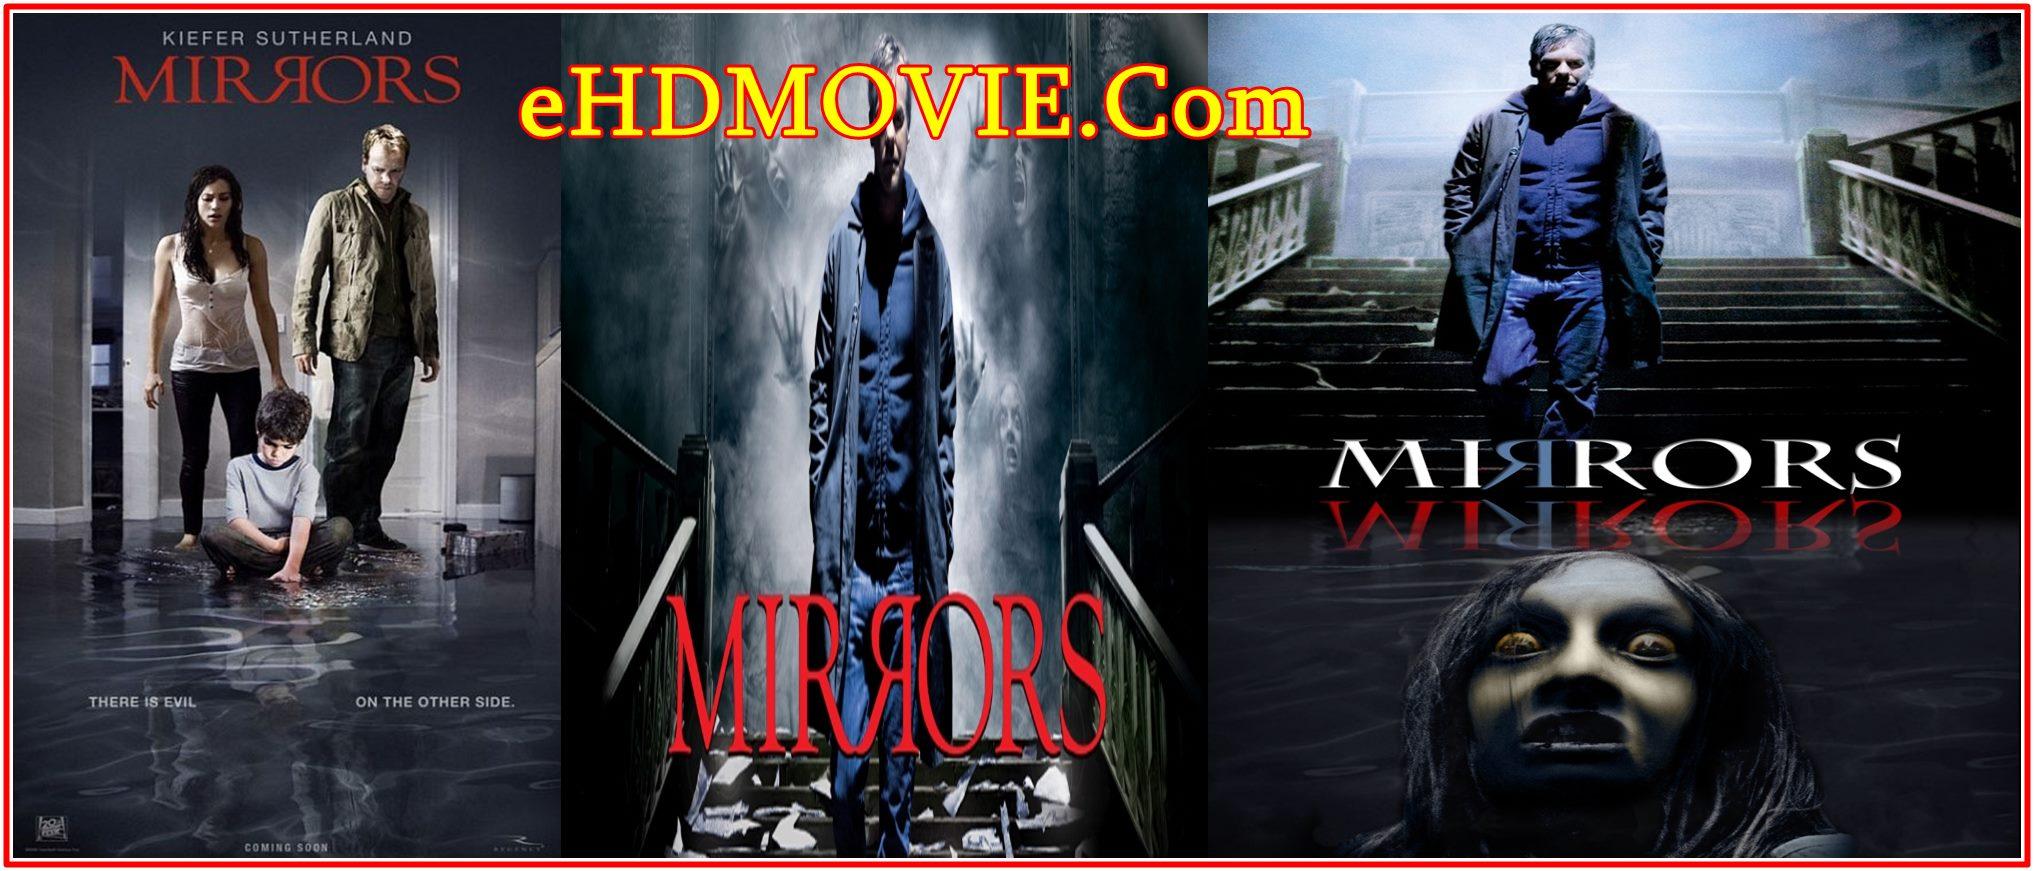 Mirrors 2008 Full Movie English 720p – 480p ORG BRRip 350MB – 800MB ESubs Free Download